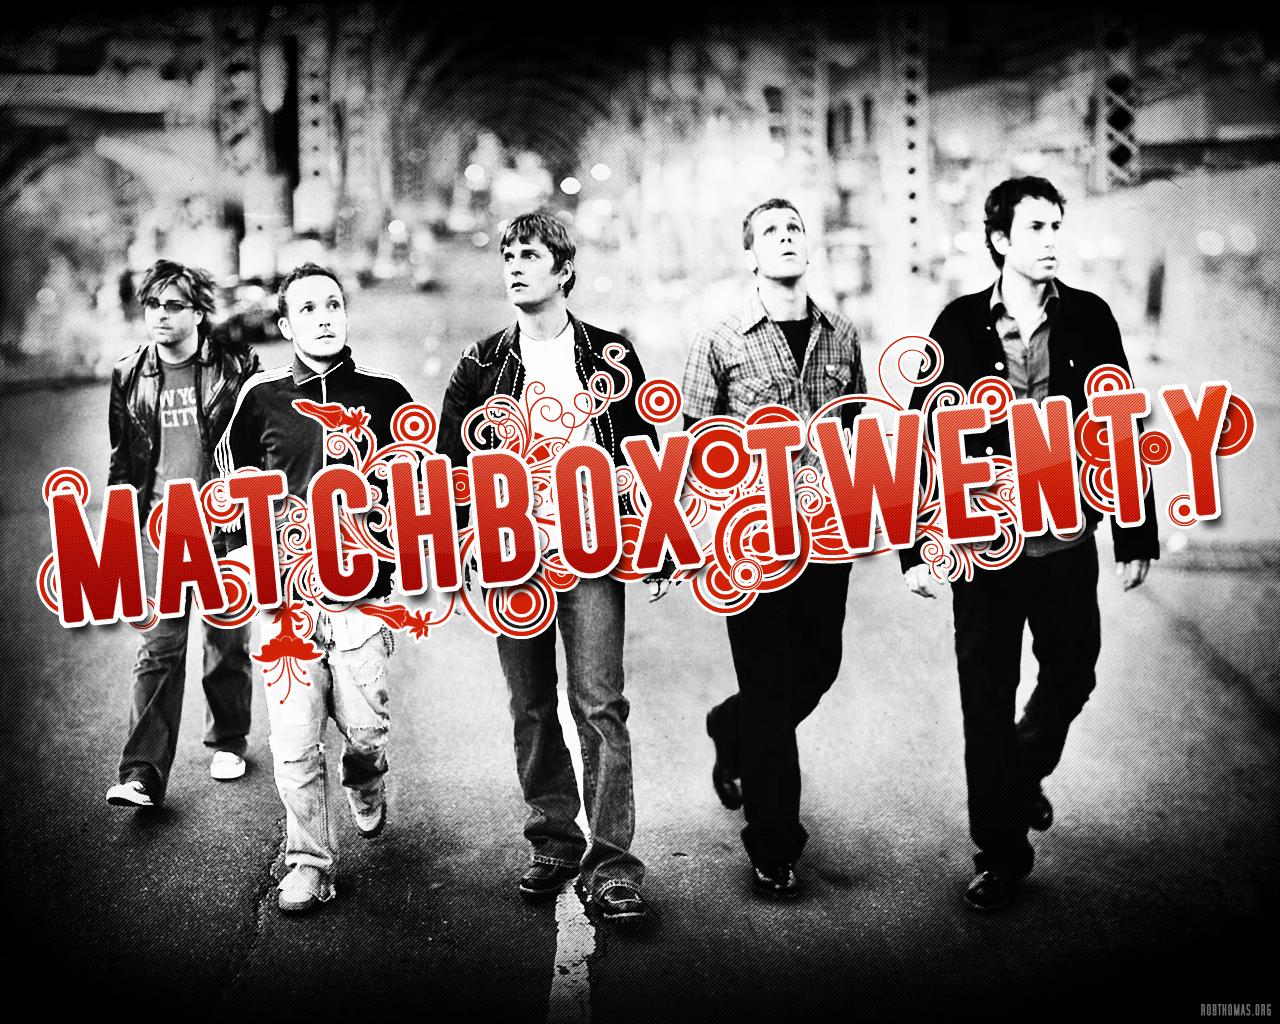 http://1.bp.blogspot.com/-mnpayjUDx8E/TpkR4LcRVRI/AAAAAAAAHJ0/TnMIkL7-t_Y/s1600/matchboxtwenty.jpg